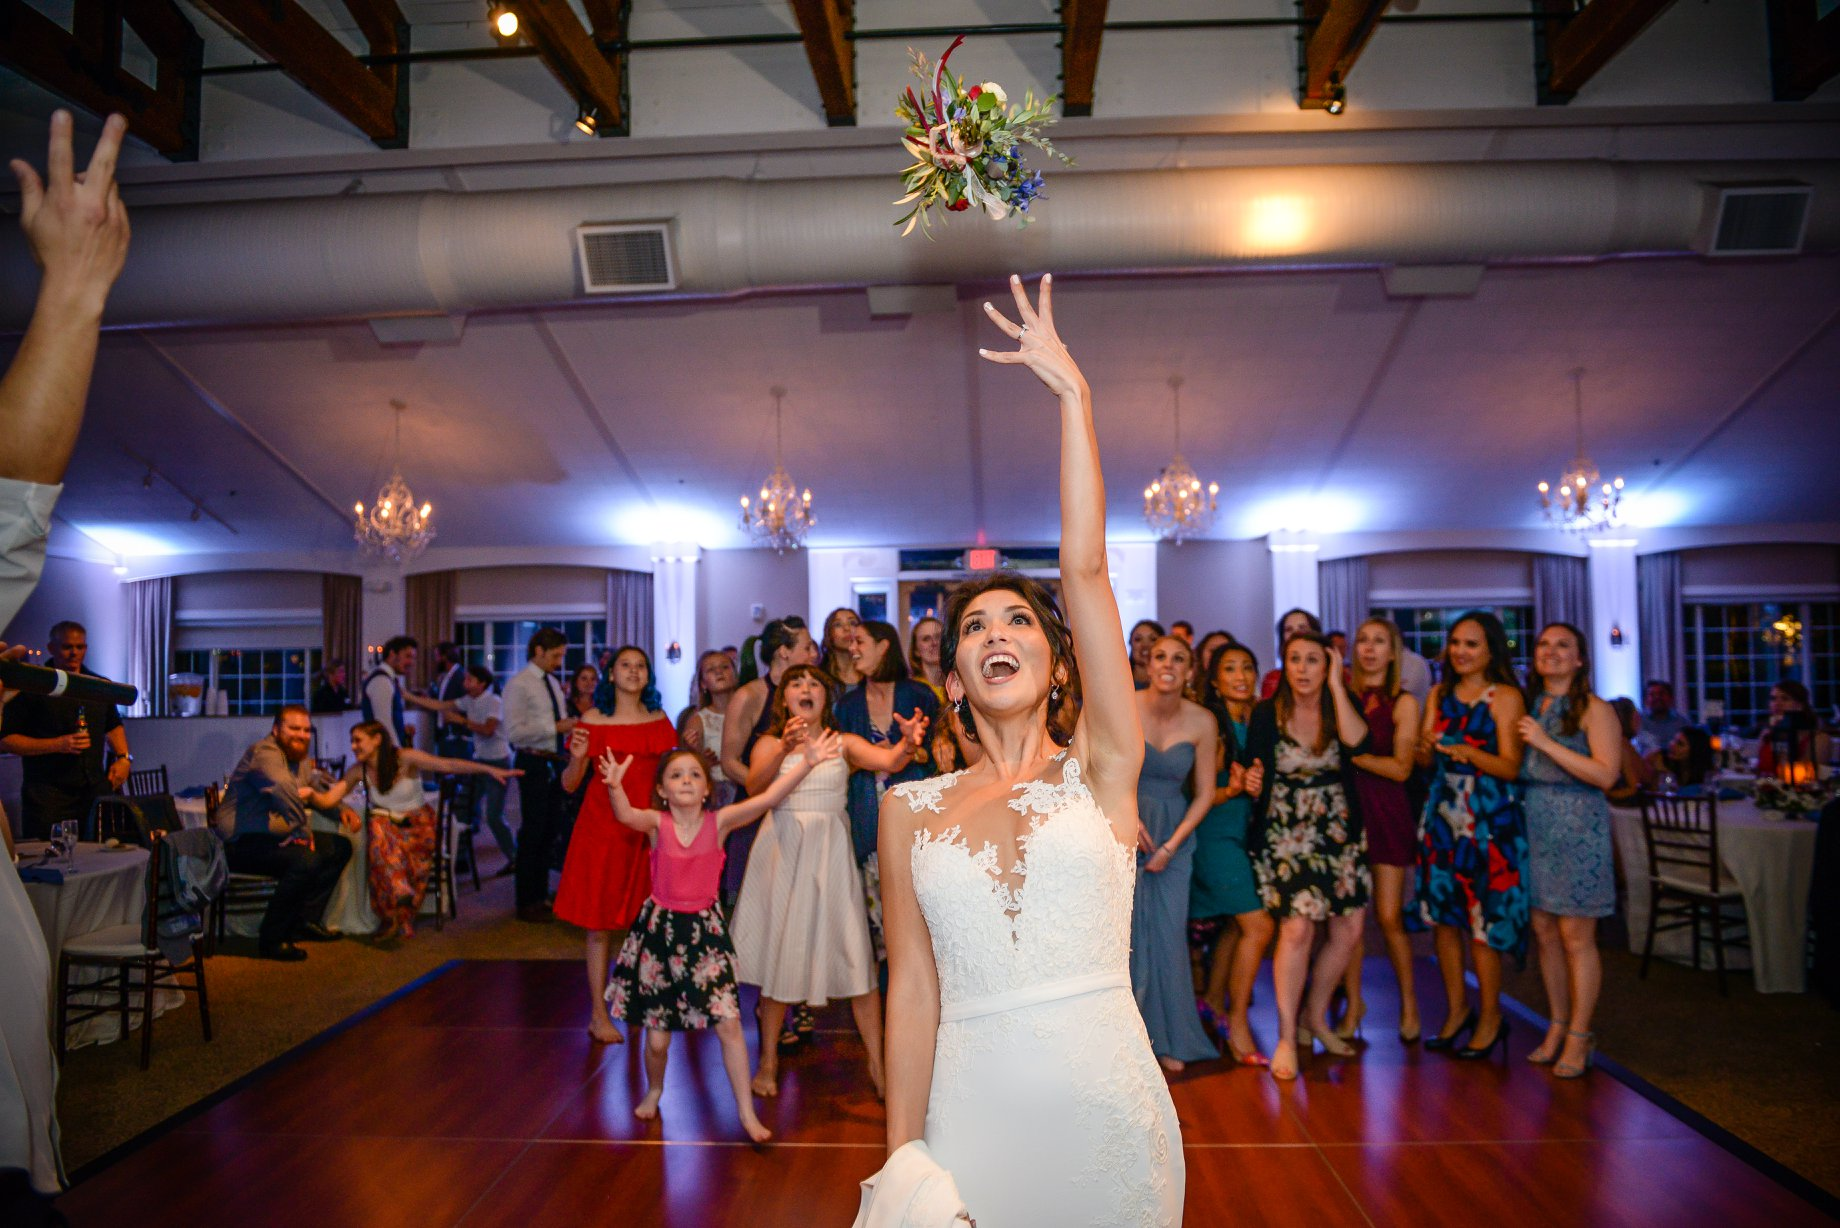 djkanoya_pontewinery-wedding-johnston-bouquet_toss.jpg